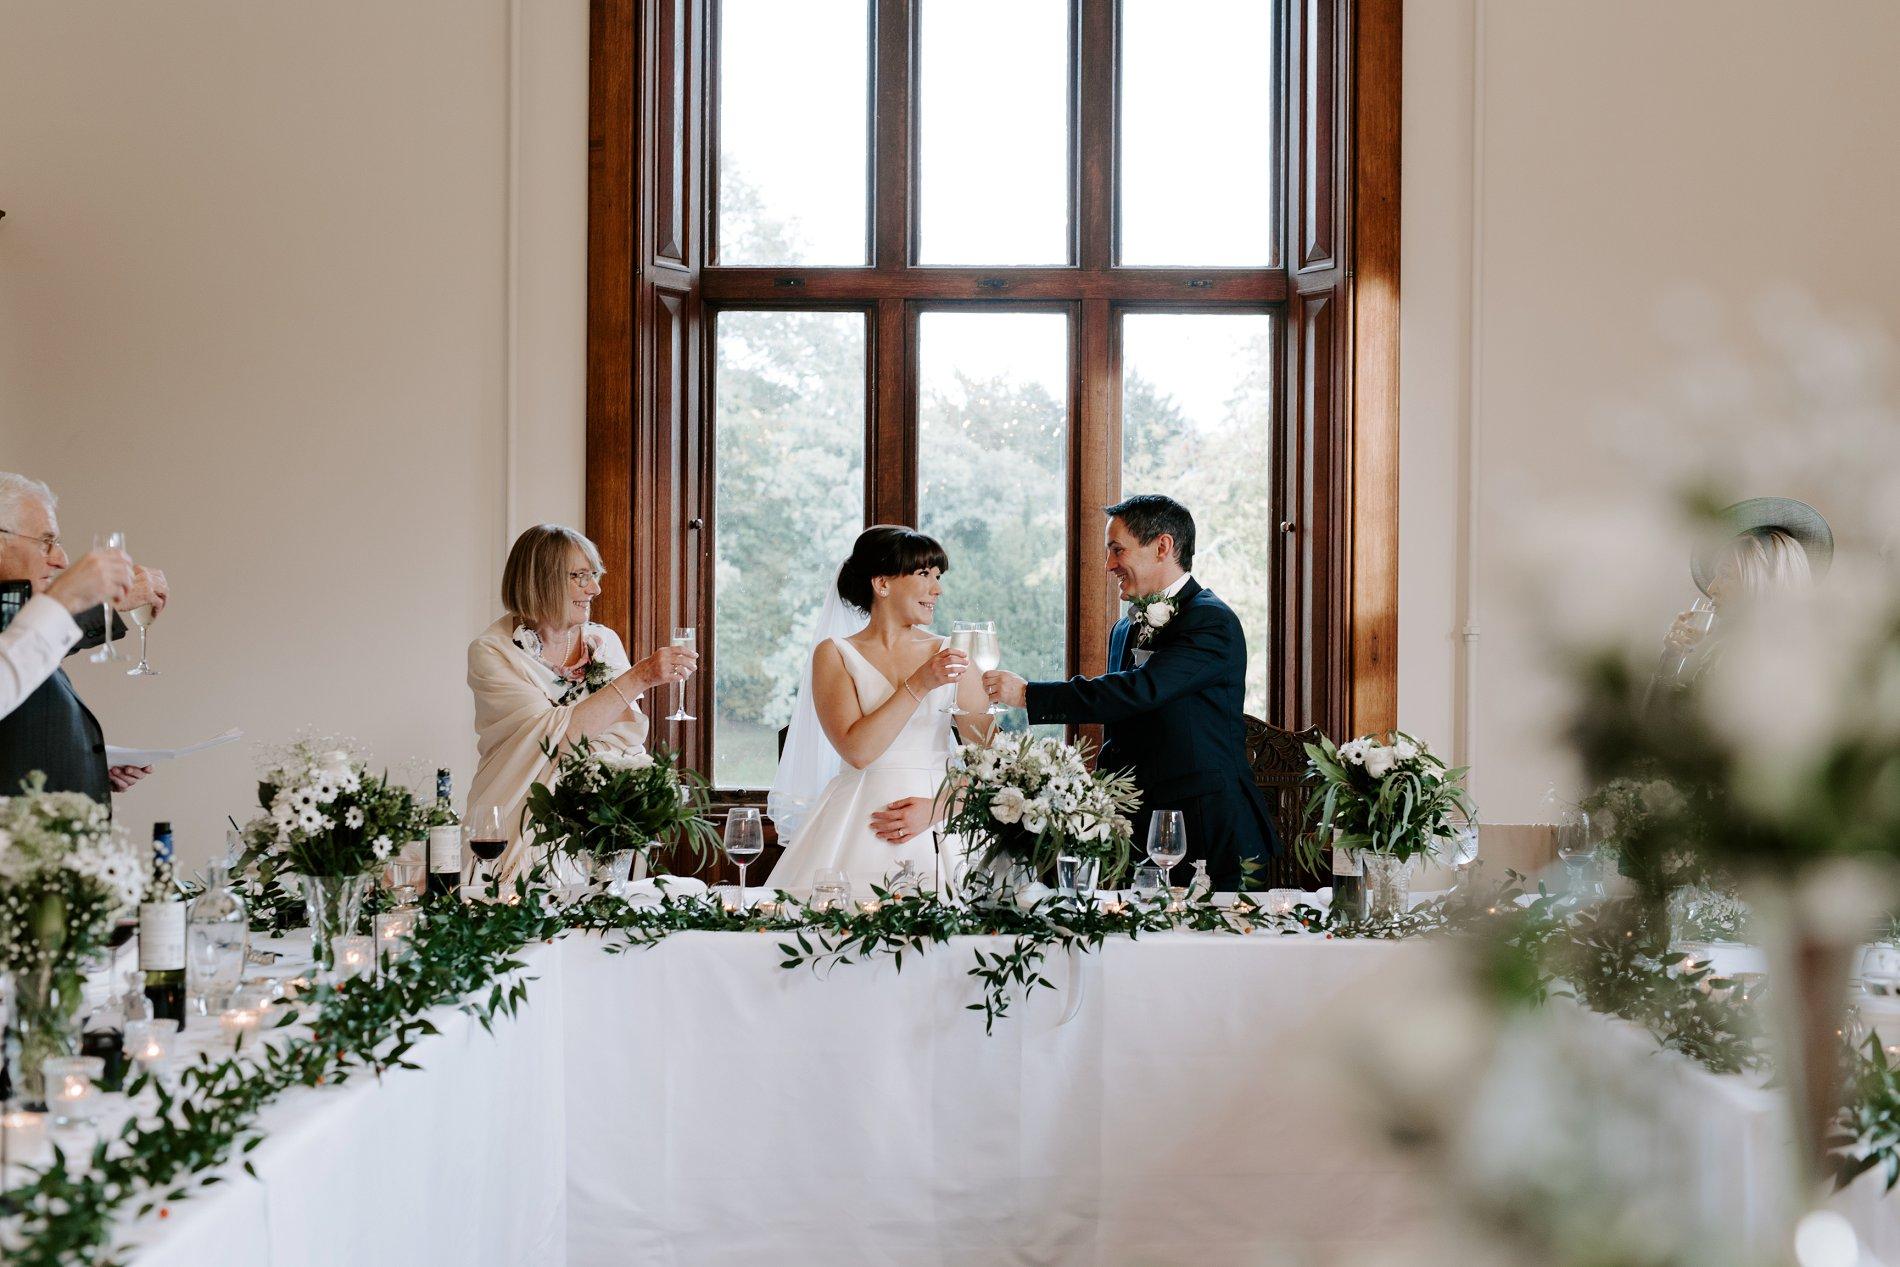 An Elegant White Wedding at Thicket Priory (c) Carla Whittingham Photography (70)